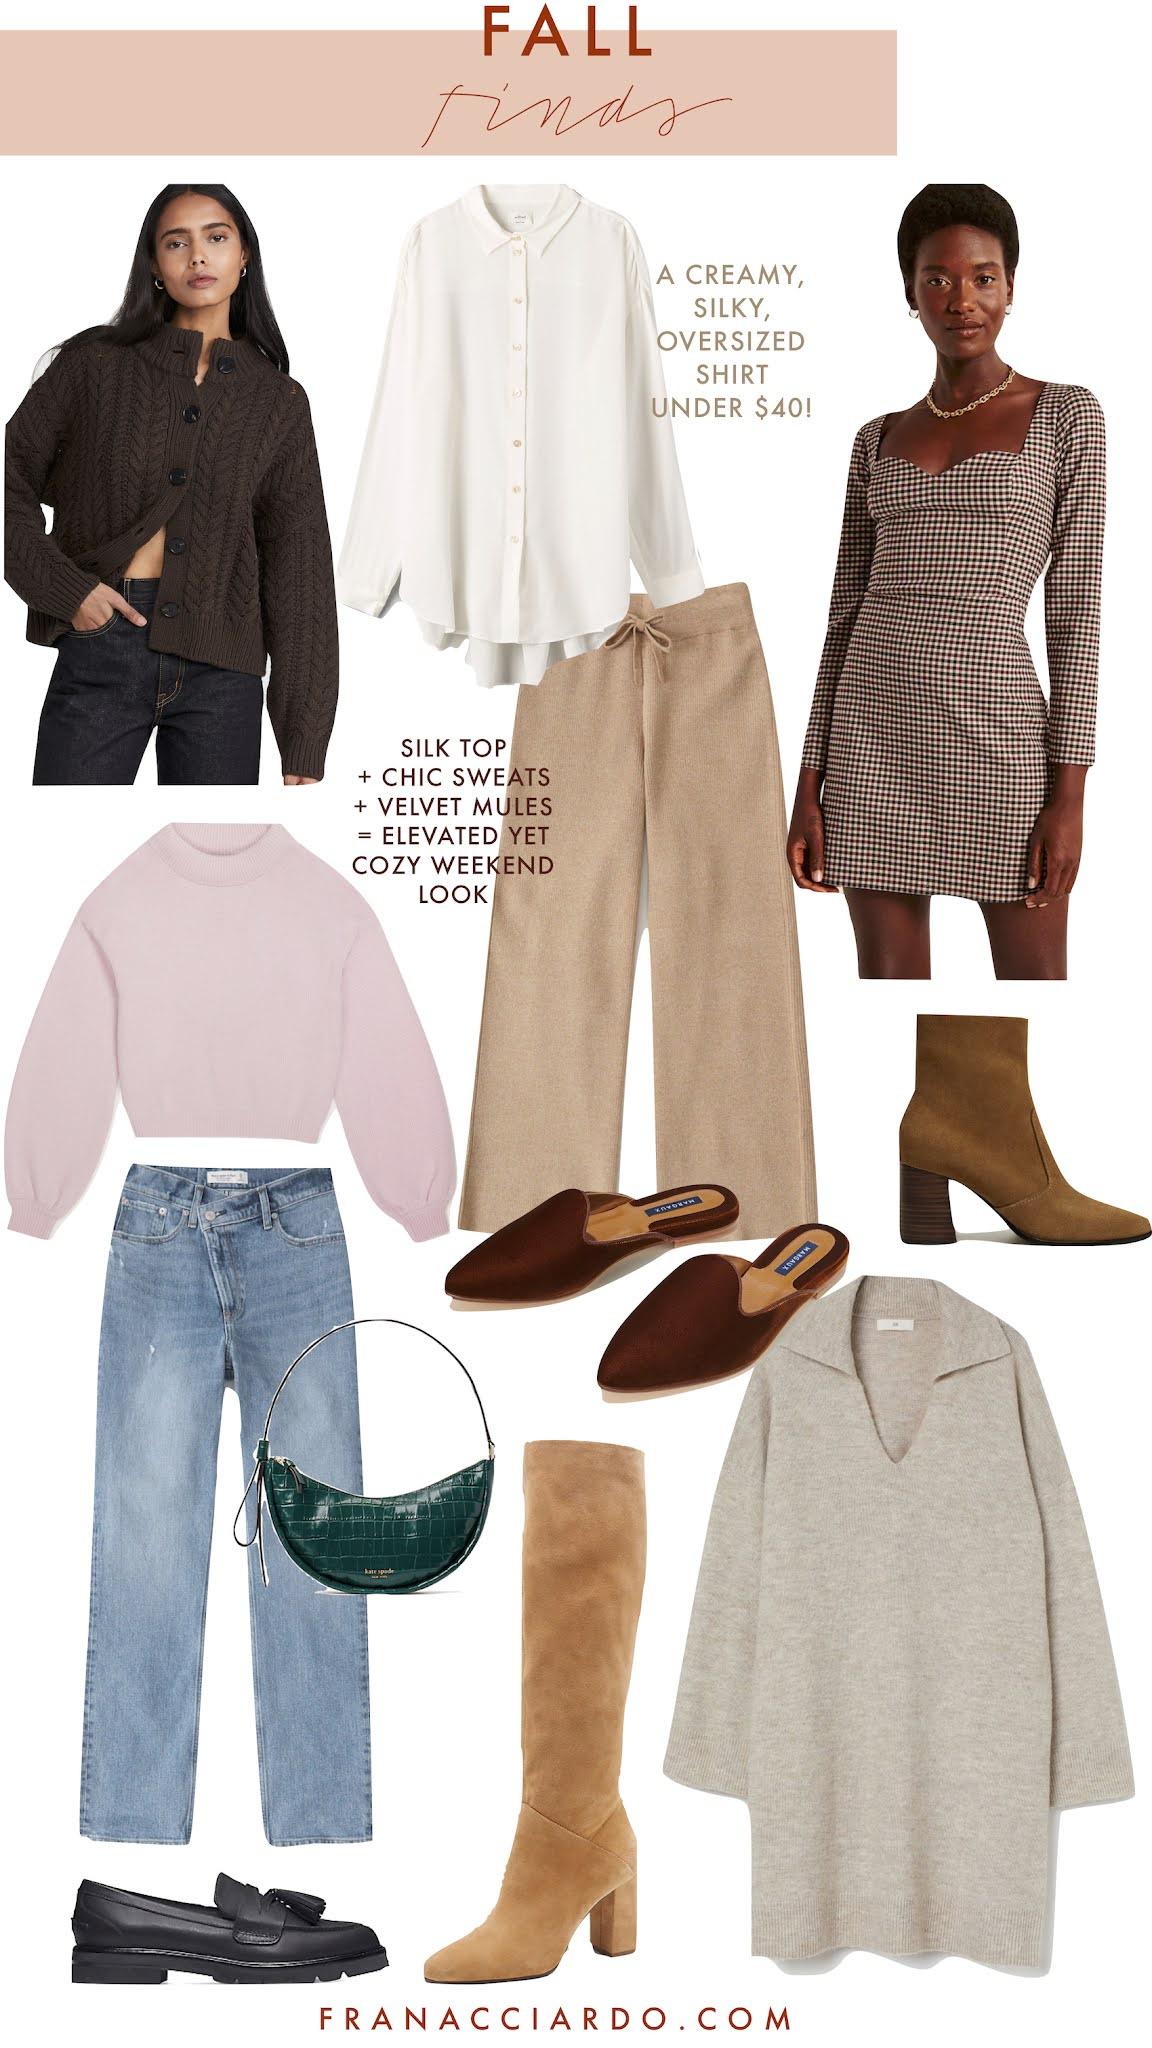 fall shopping wishlist 2021 autumn fashion under $100 fran acciardo